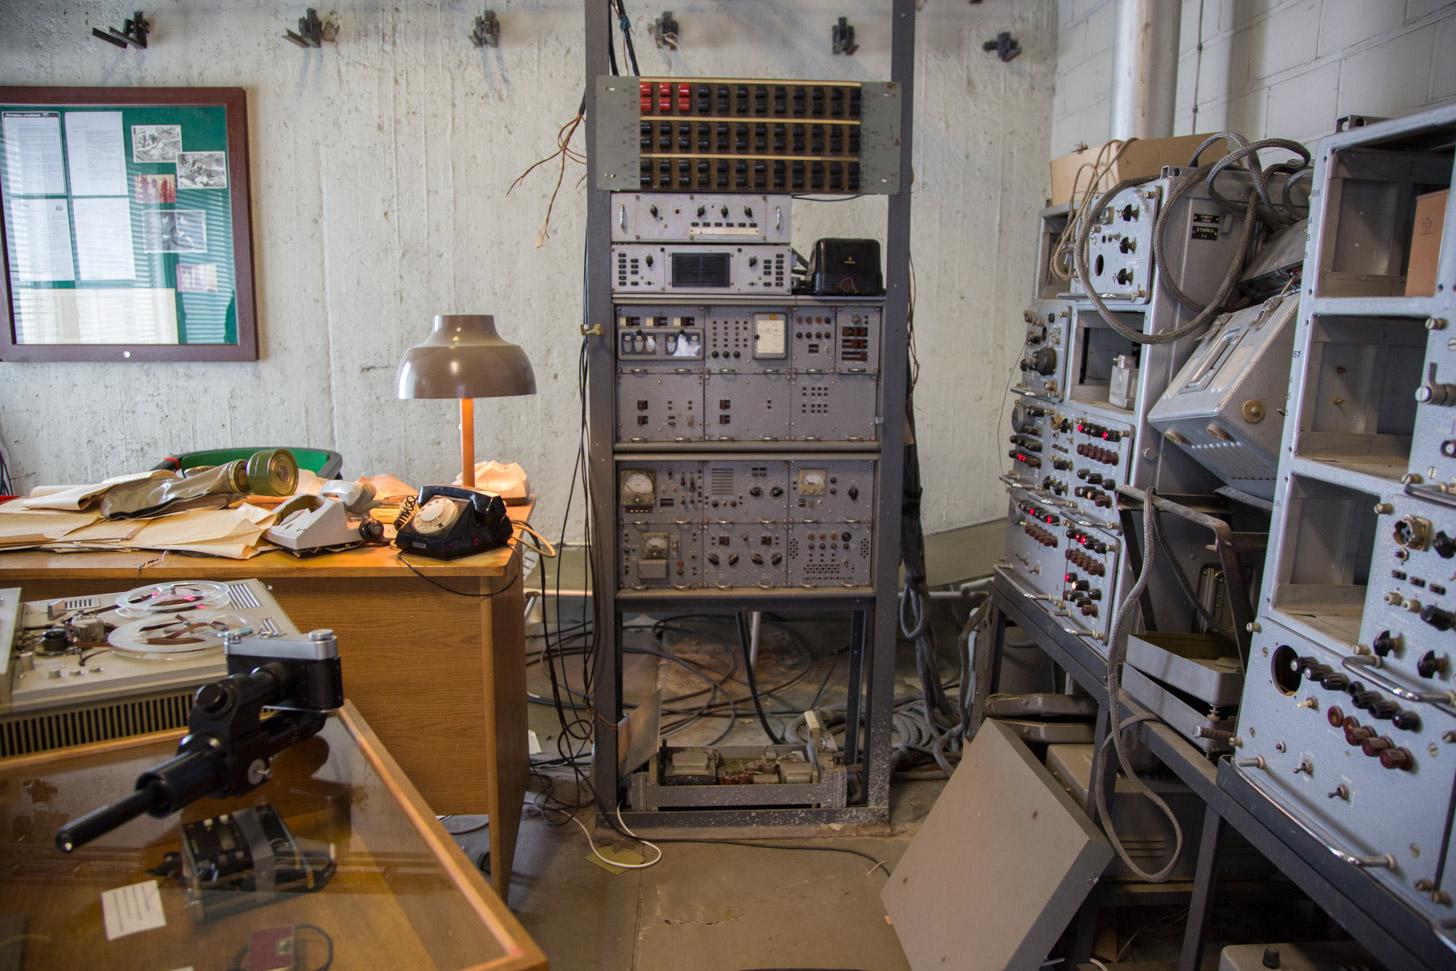 Apparatuur in het KGB Museum